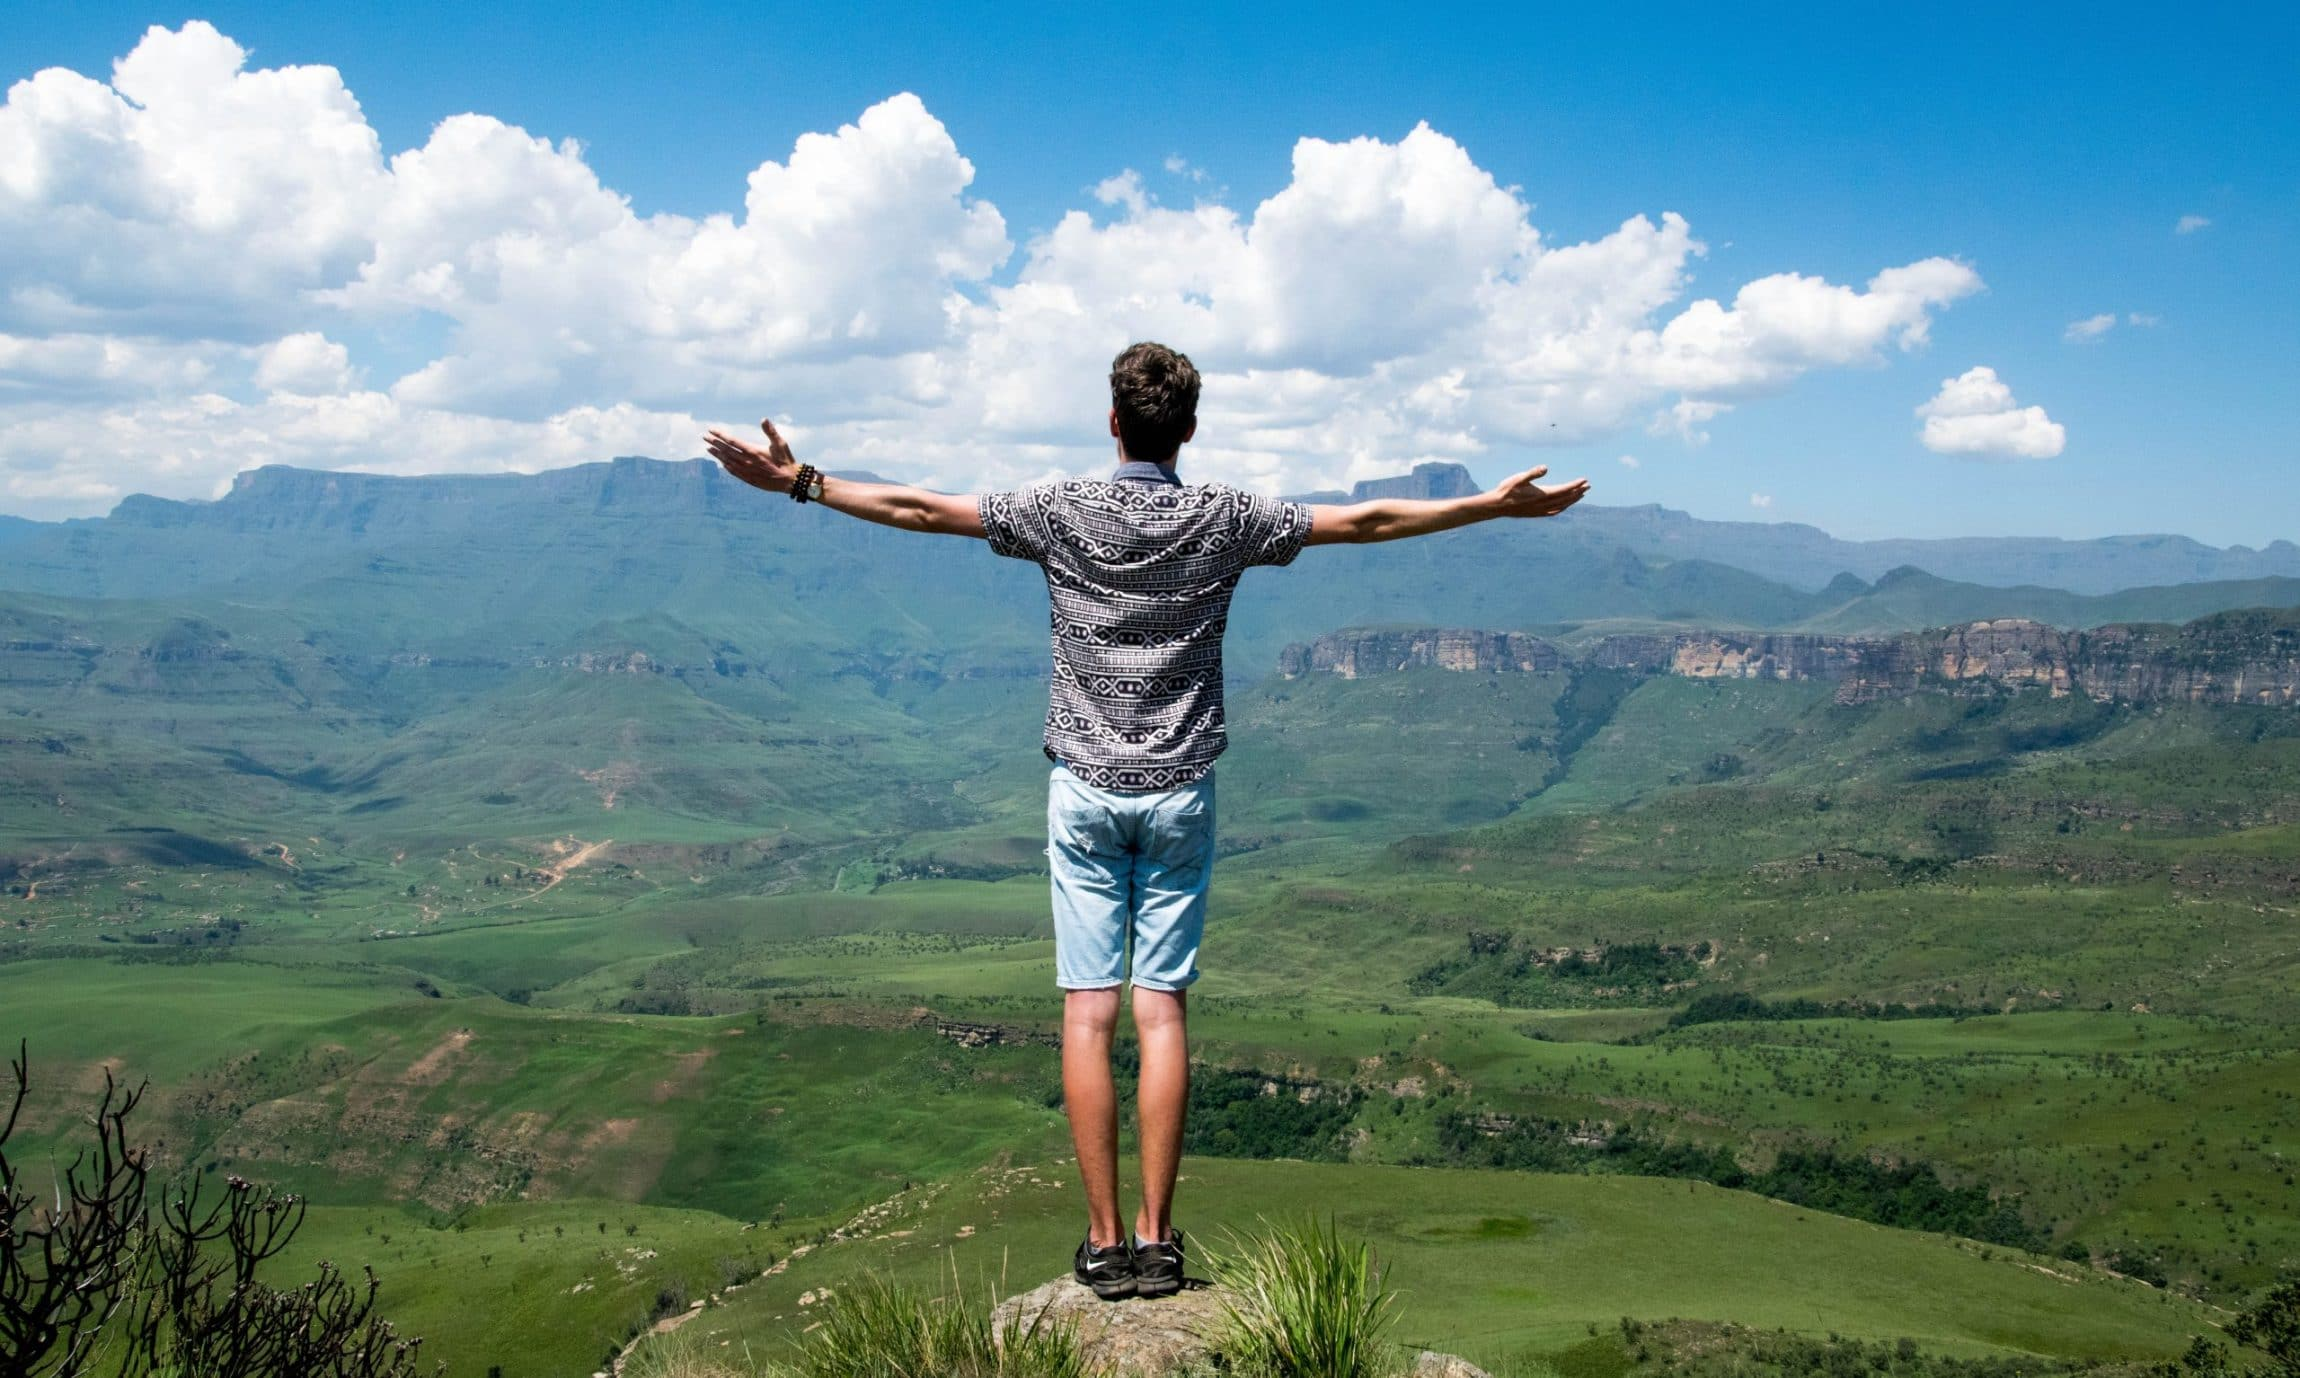 How Can I Feel Self-Fulfilled or Successful?